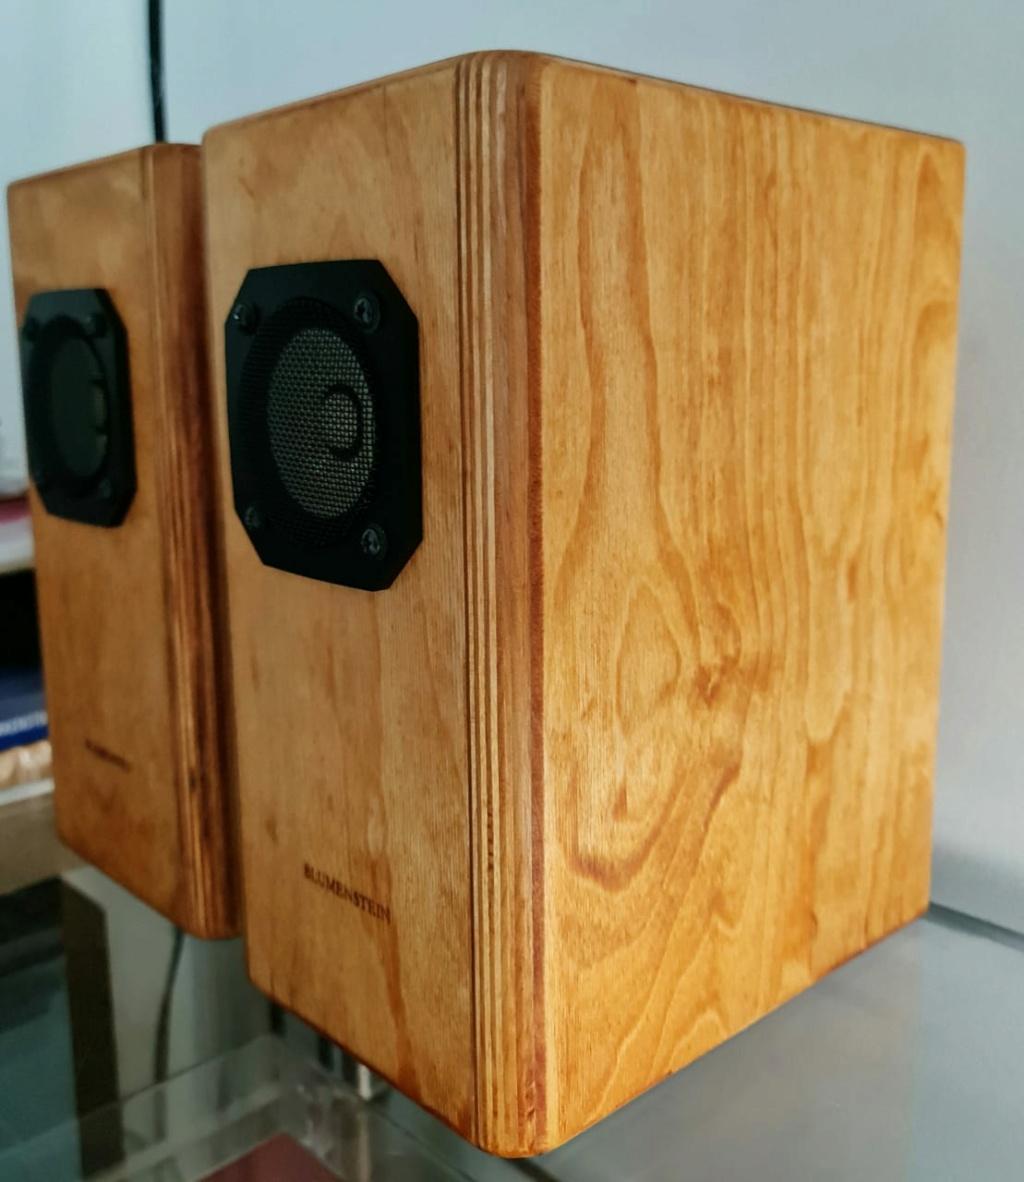 "Blumenstein Audio Orca 3"" Full Range Speakers Blumen13"